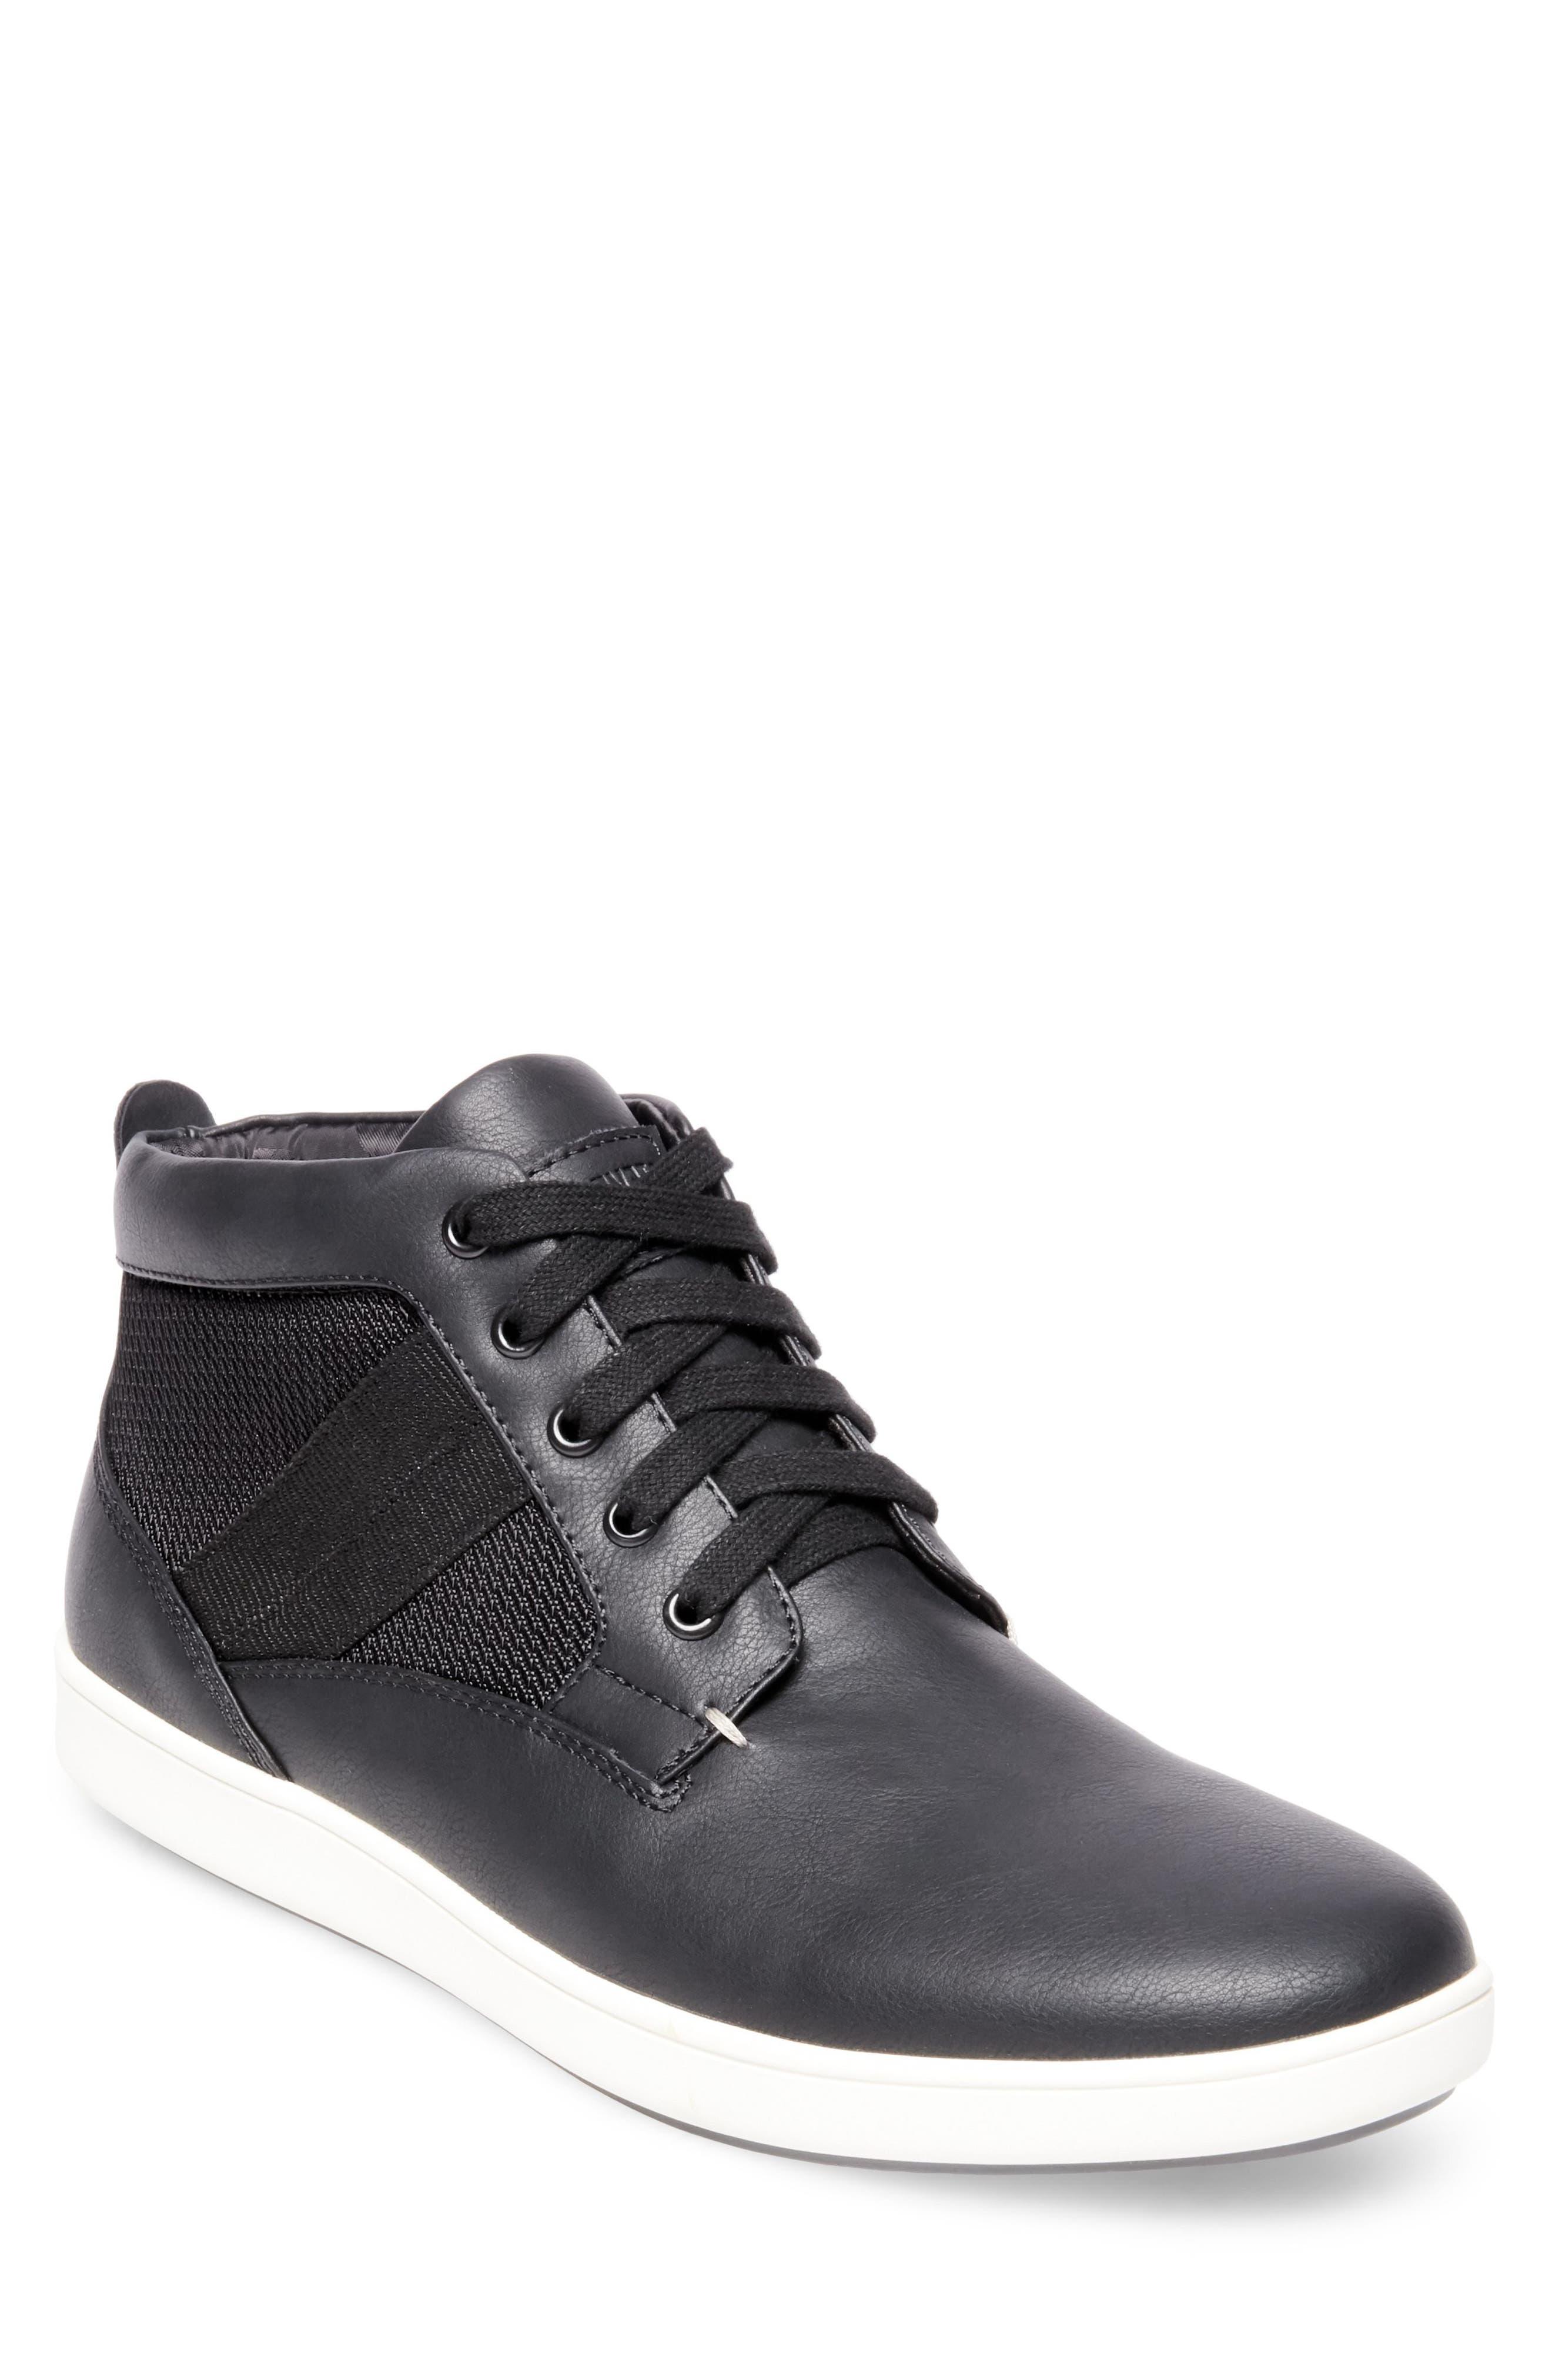 Frazier Sneaker Boot,                         Main,                         color, 007